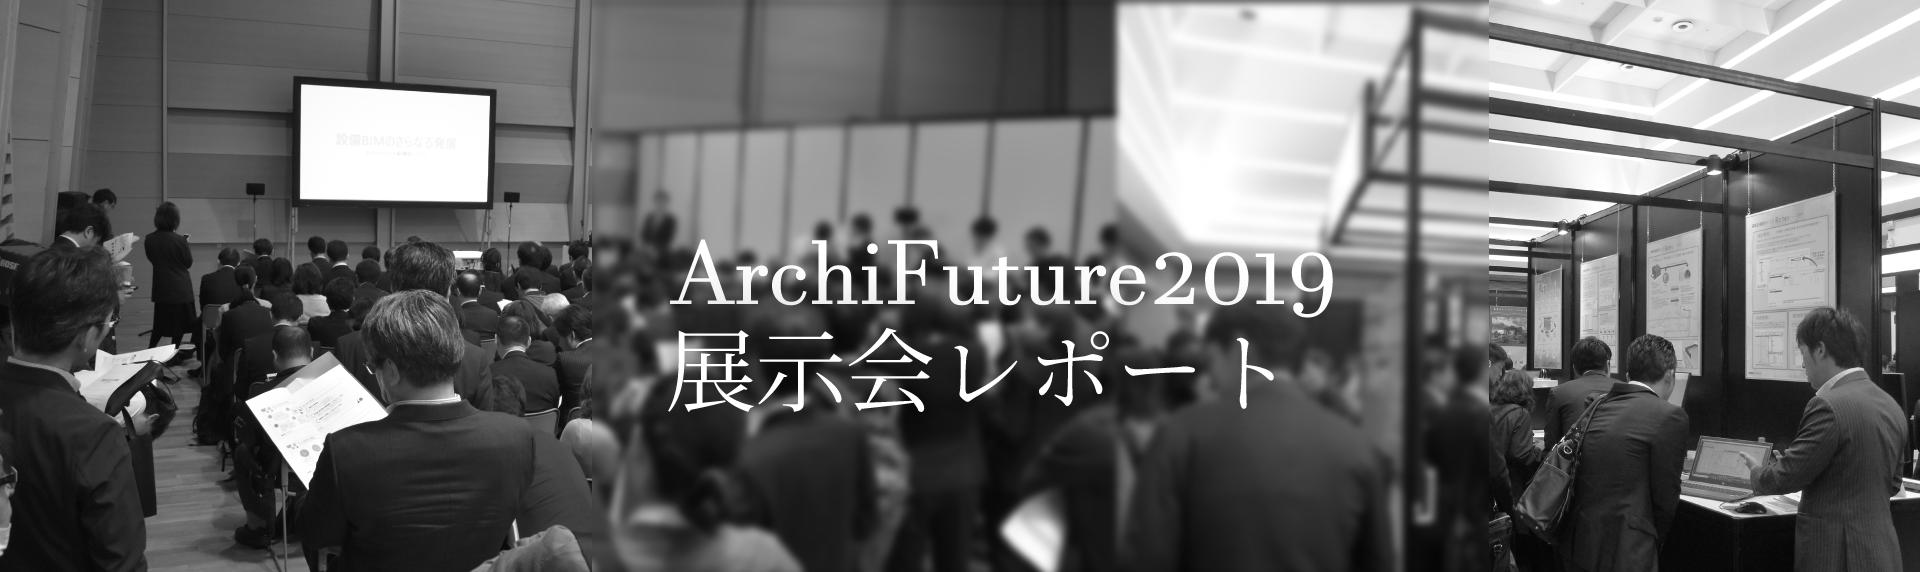 ArchiFuture2019 展示会レポート